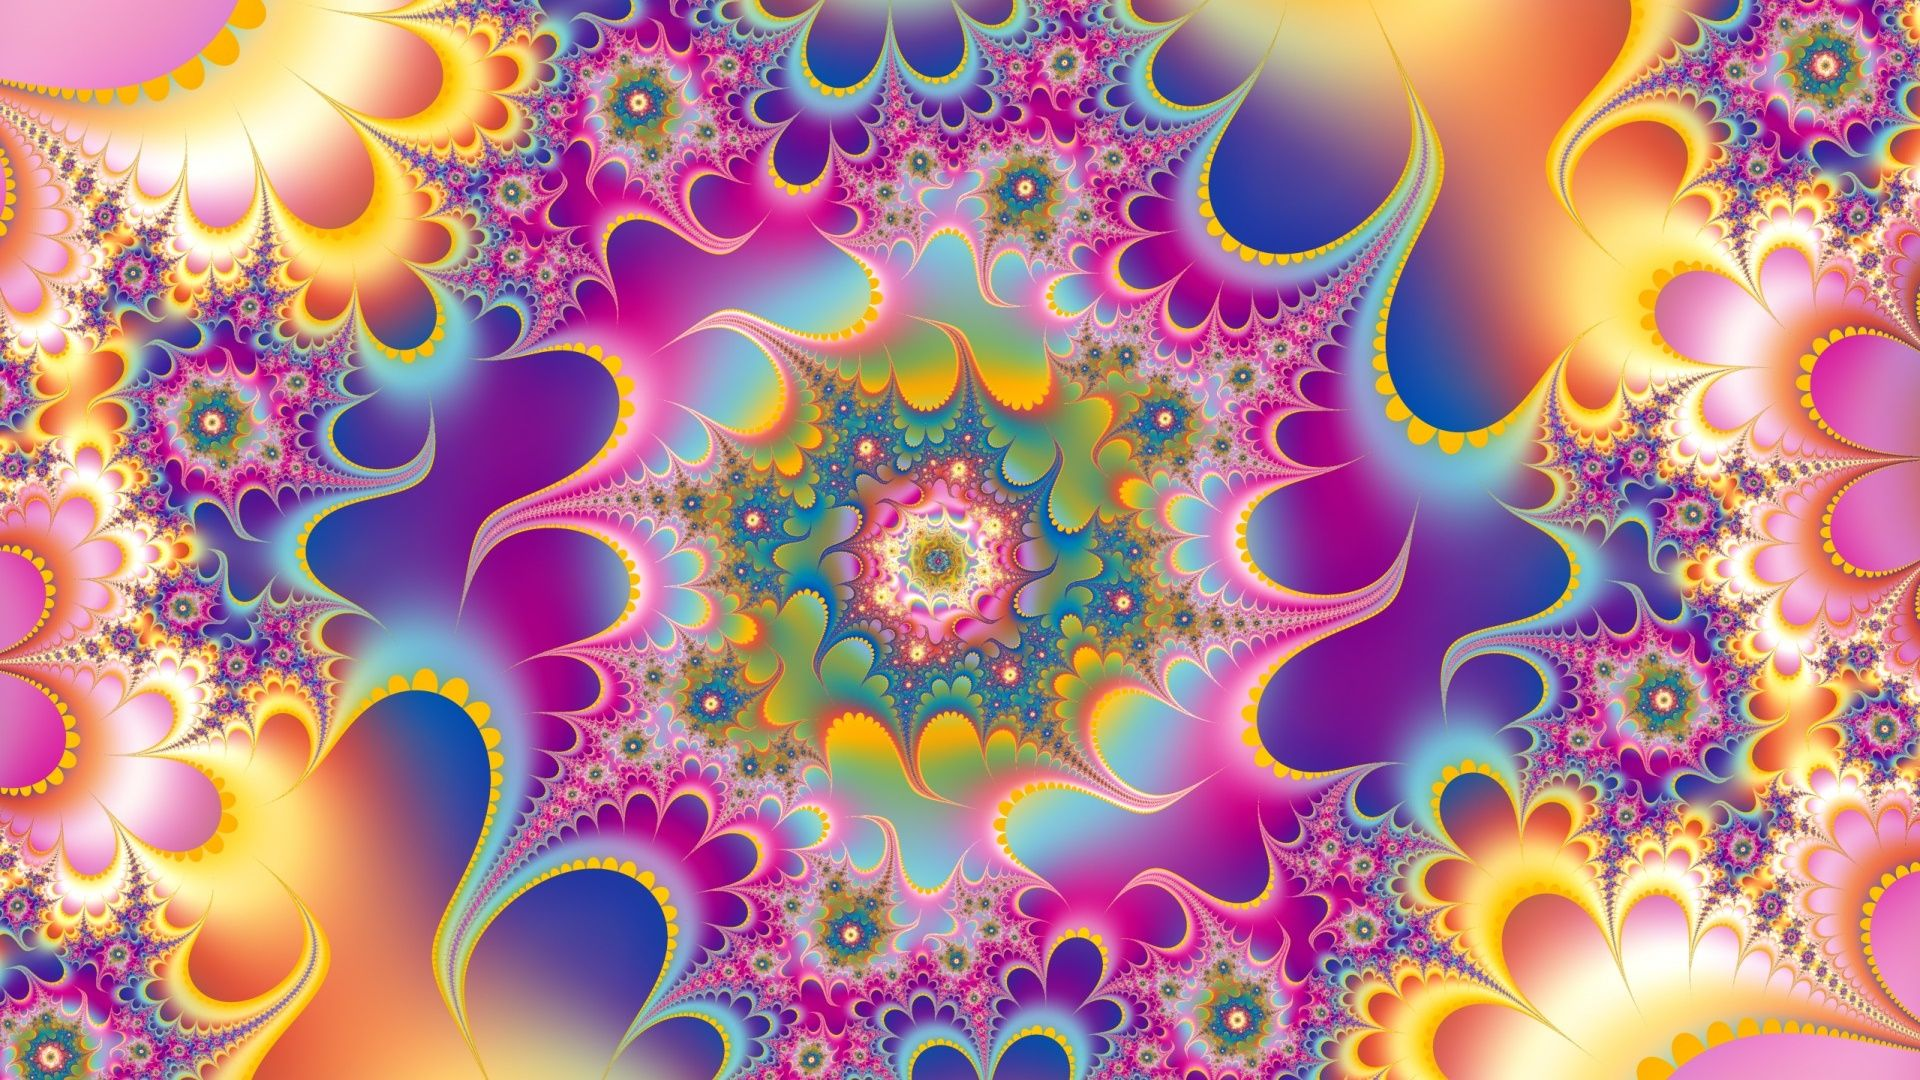 Kaleidoscope beautiful wallpaper